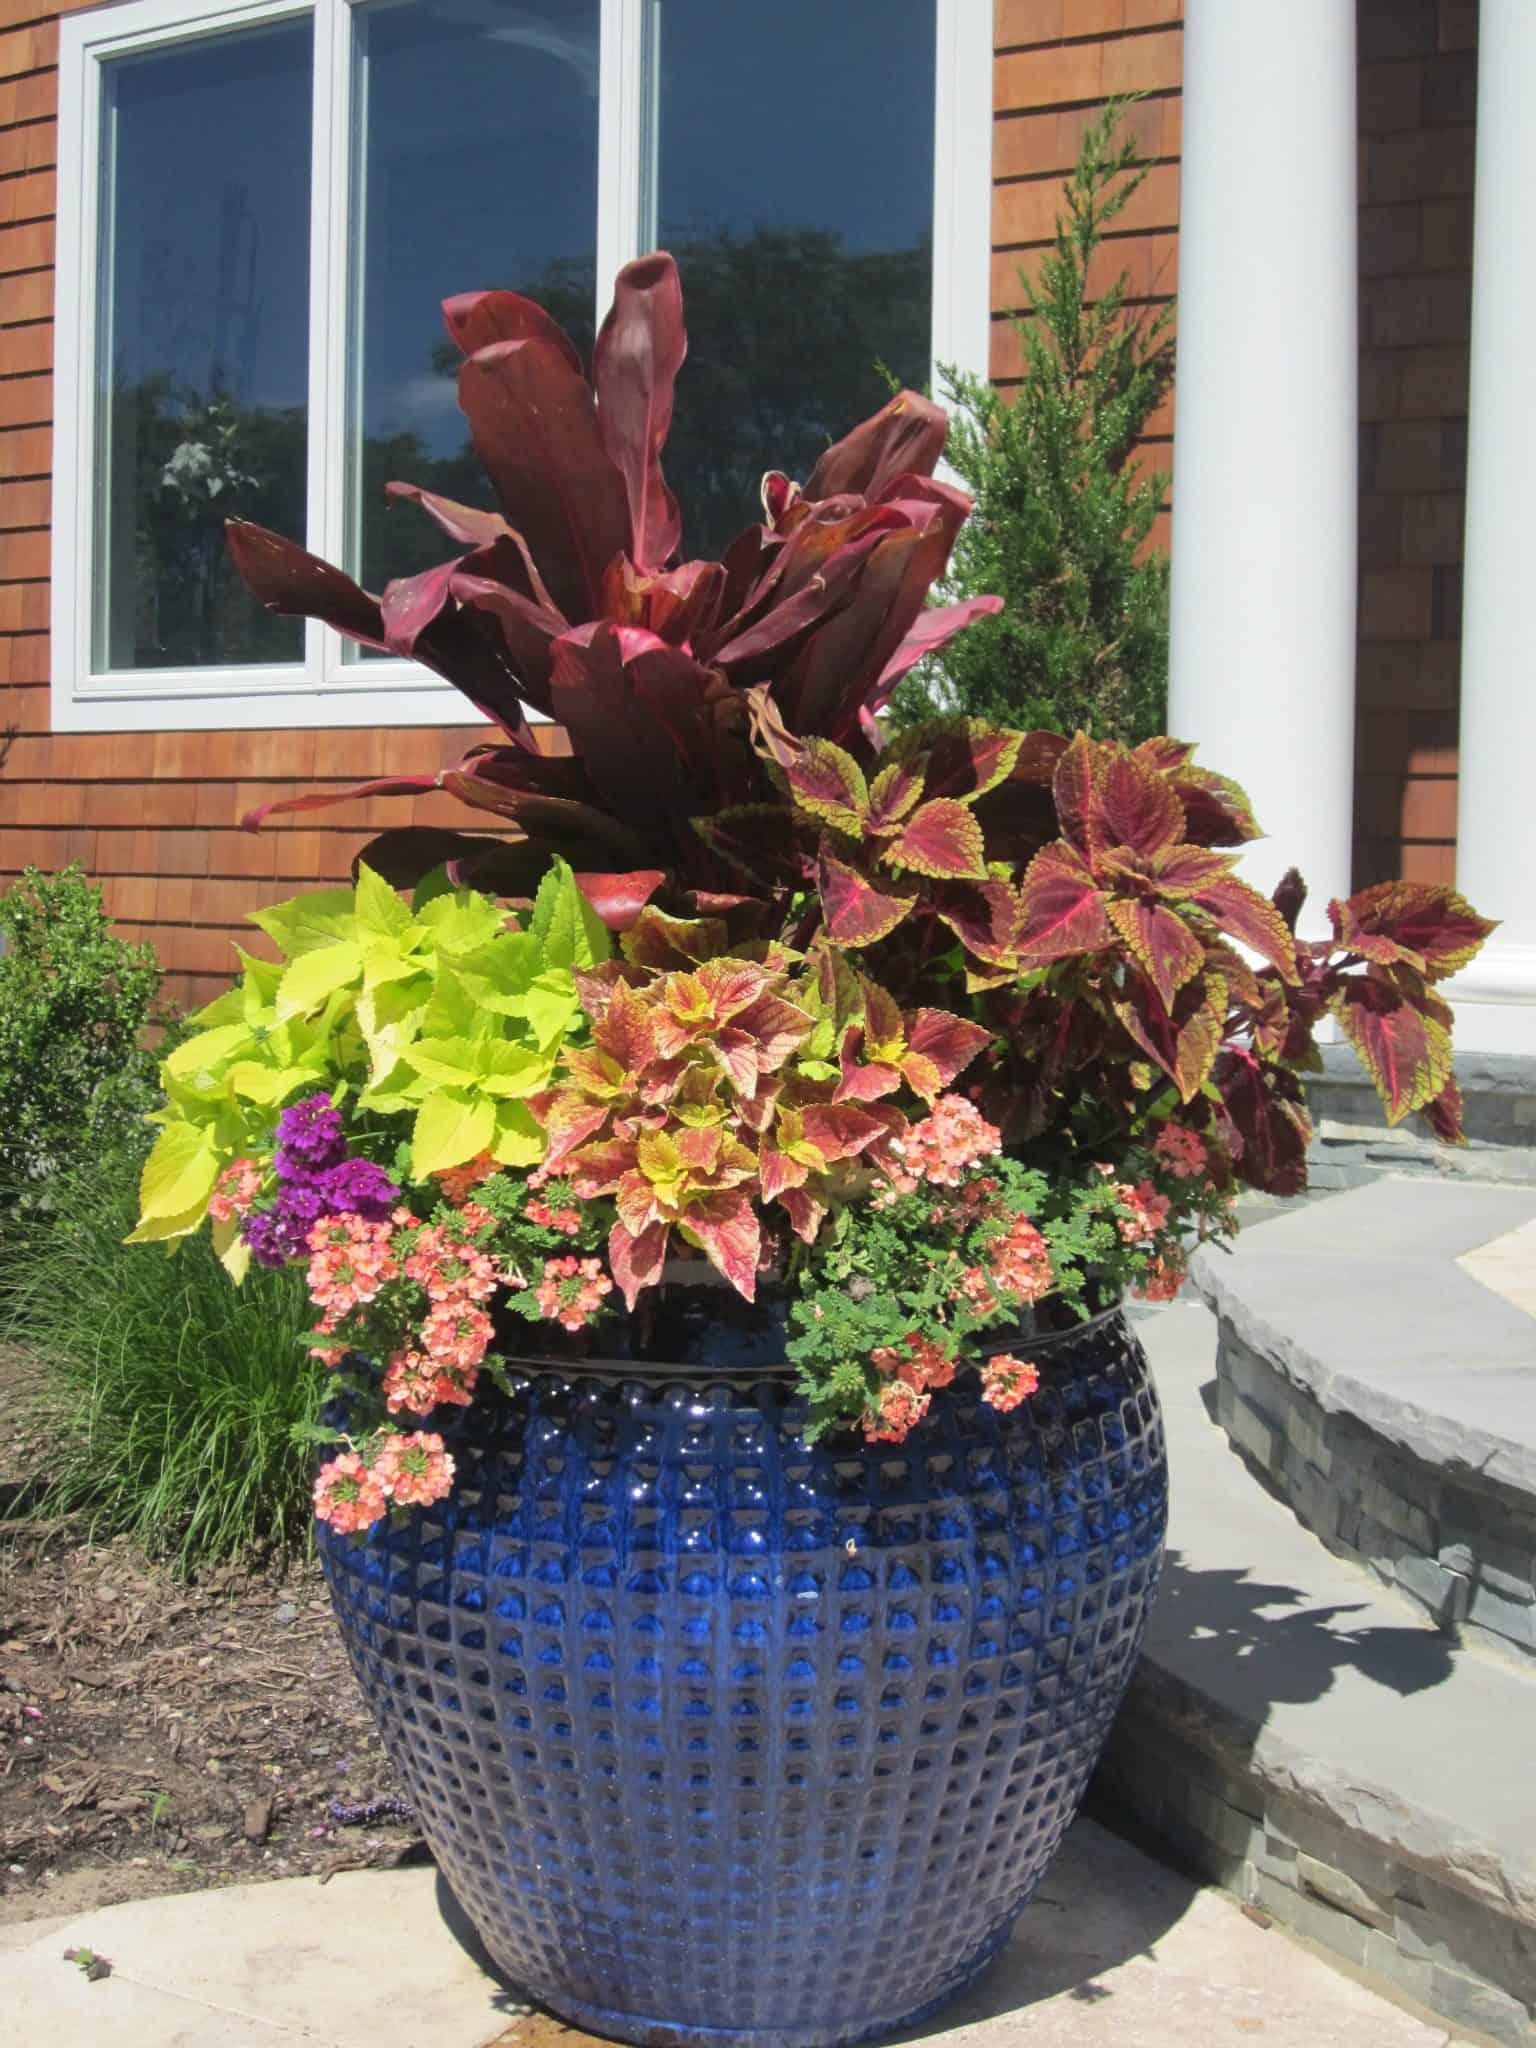 36 inch Glazed Diamond Pottery planted with Coleus, Tie, and Verbena - Southampton, Long Island